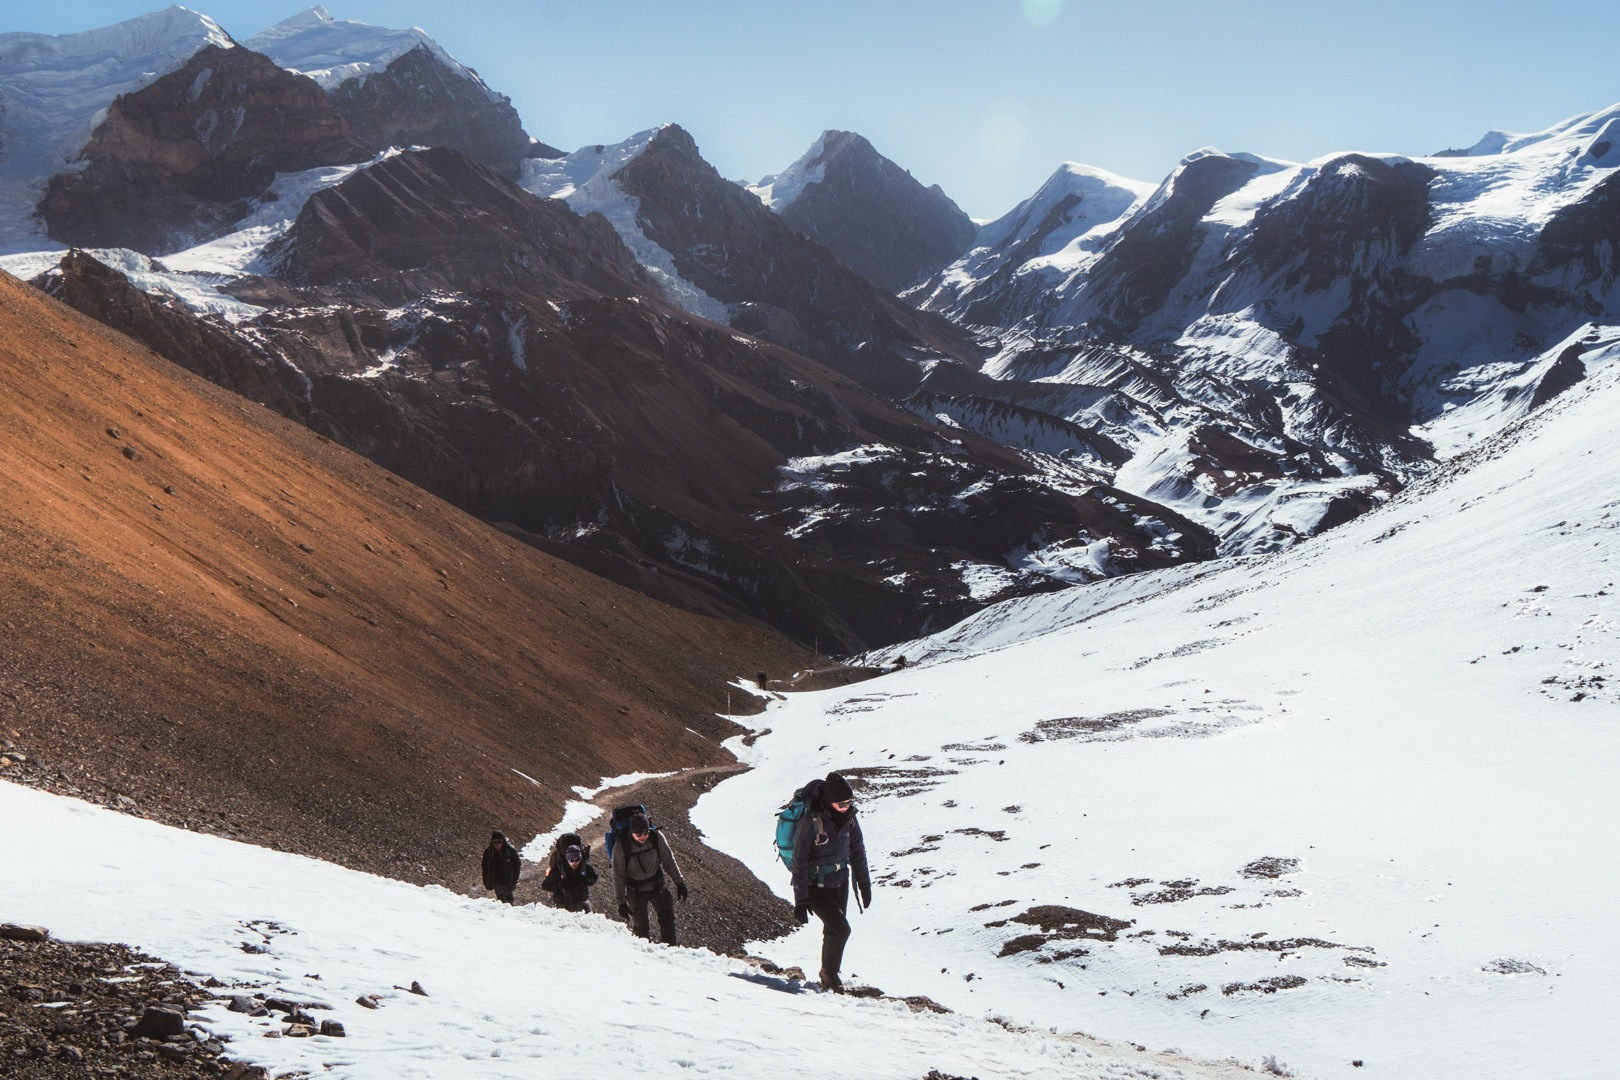 Thorong La Pass on the Annapurna Circuit | Photo by Ana Pereira